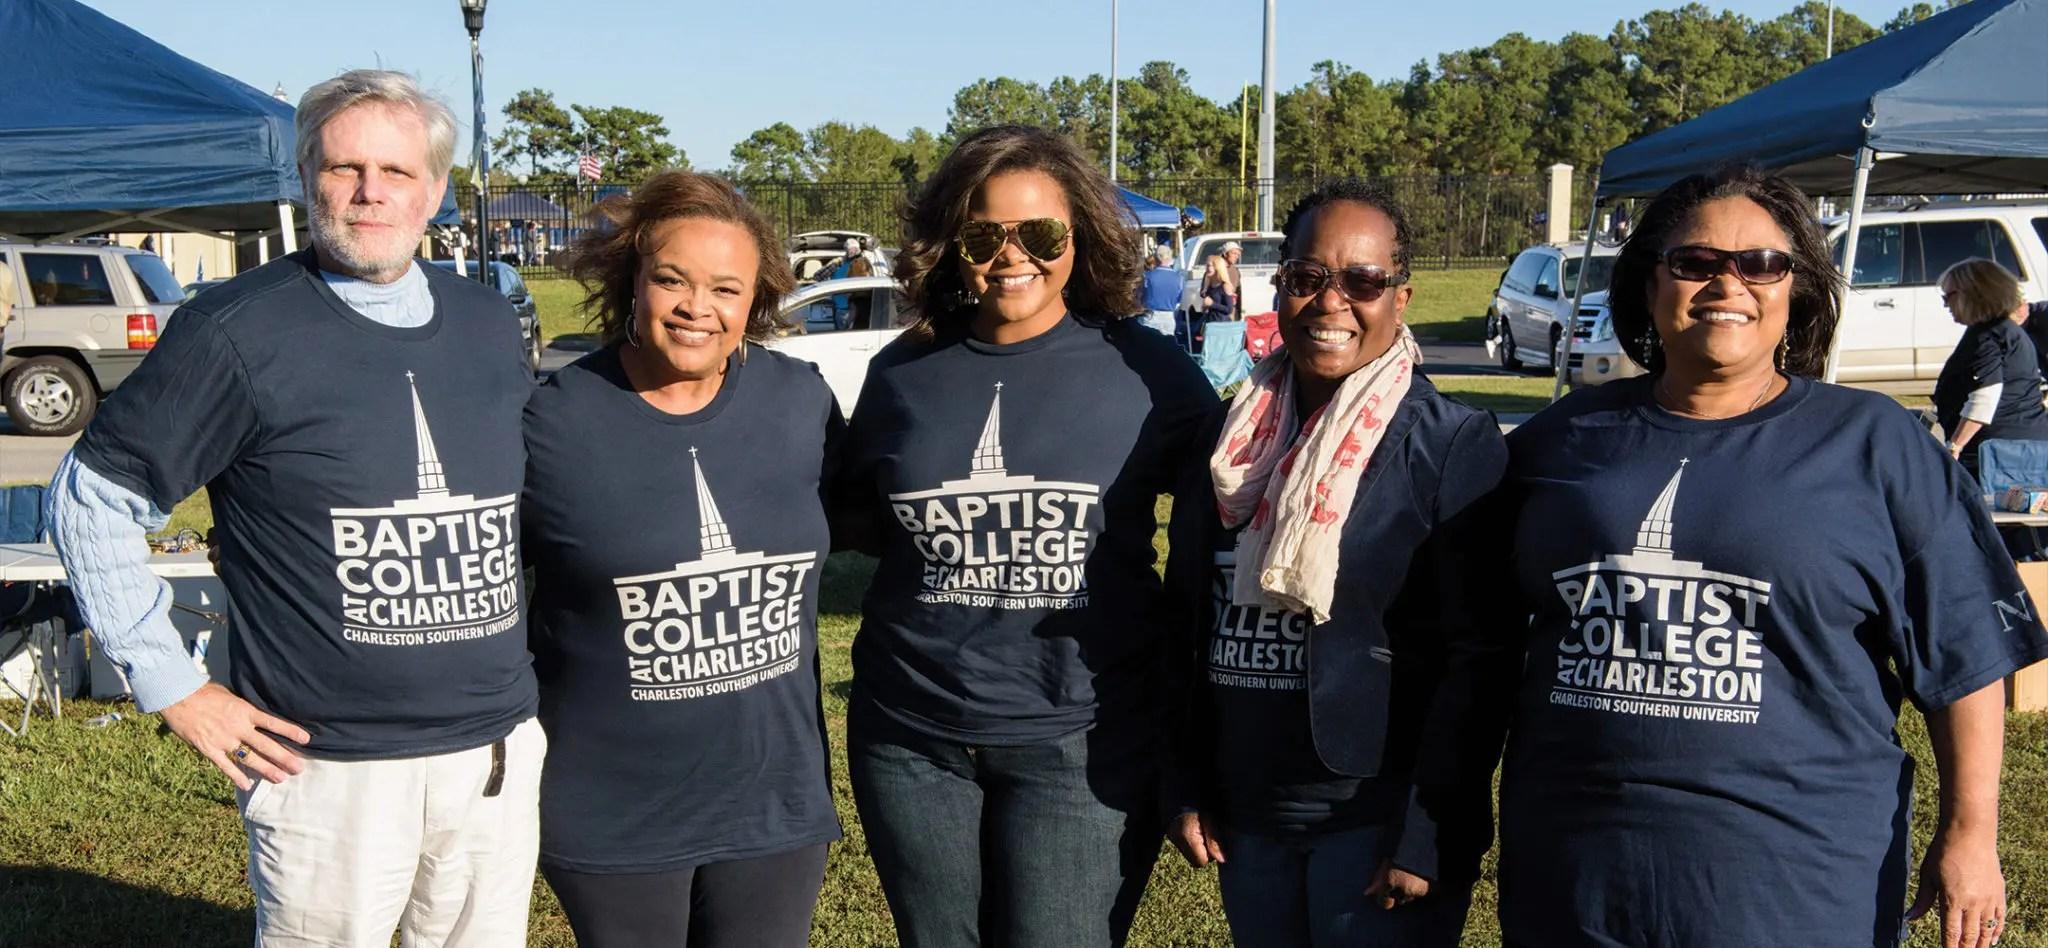 CSU alumni wearing Baptist College t-shirts.